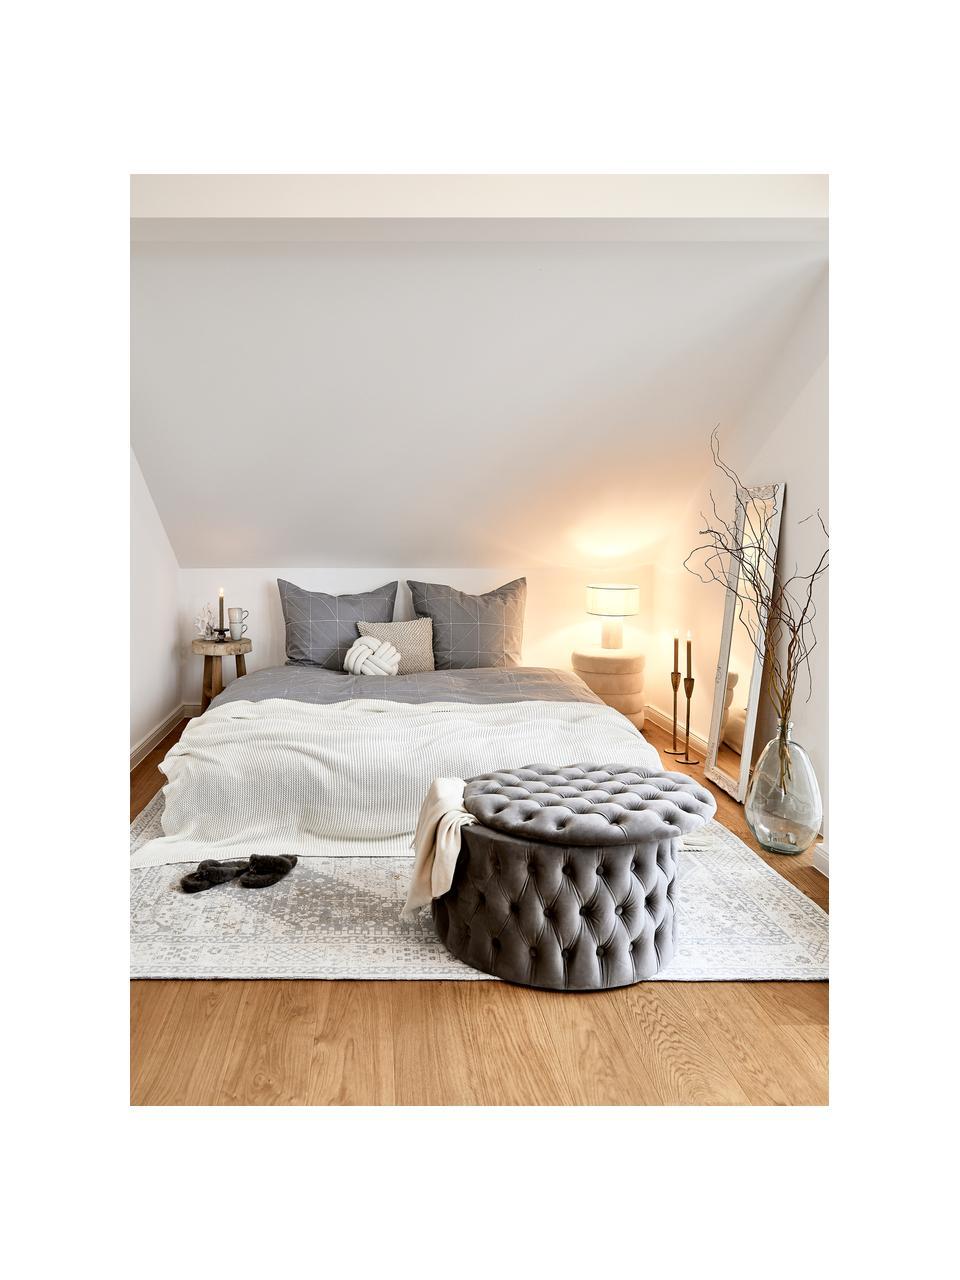 XL Samt-Hocker Chiara mit Stauraum, Bezug: Samt (Polyester) Der hoch, Korpus: Eukalyptusholz, Grau, Ø 70 x H 42 cm